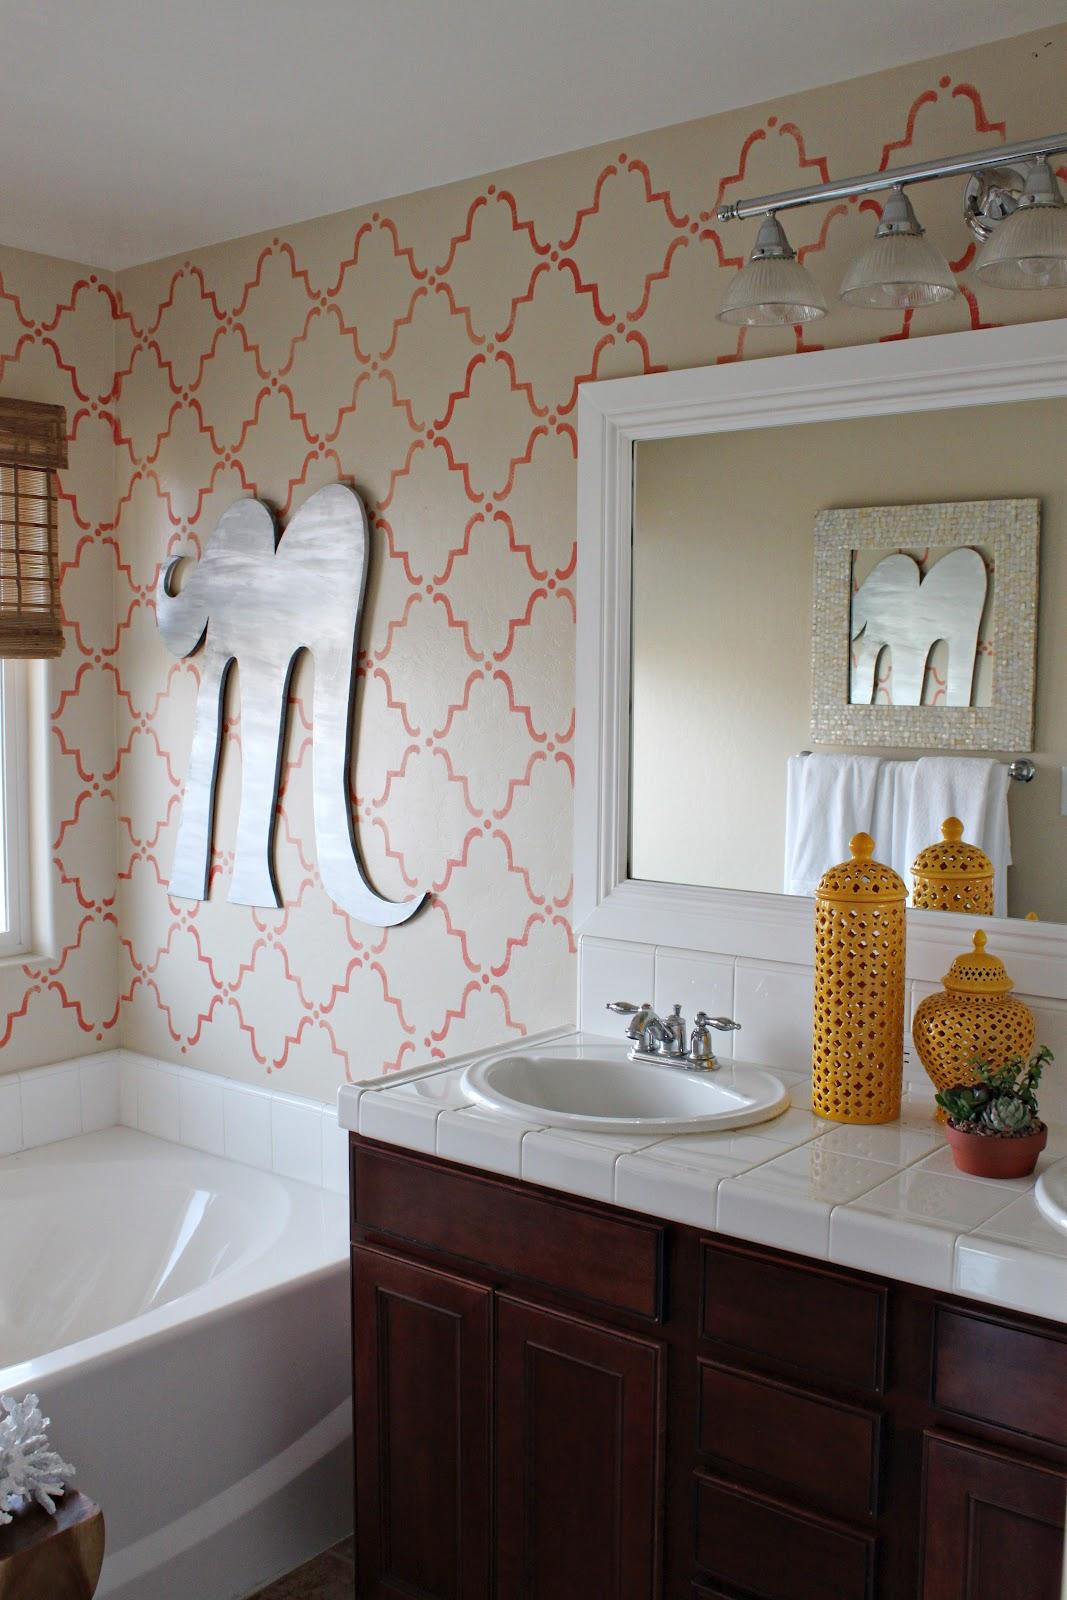 DIY Oversized Zinc Letter - Anthropologie Inspired - No. 2 Pencil on kelly wearstler bathroom design, houzz bathroom design, ikea bathroom design, waterworks bathroom design,